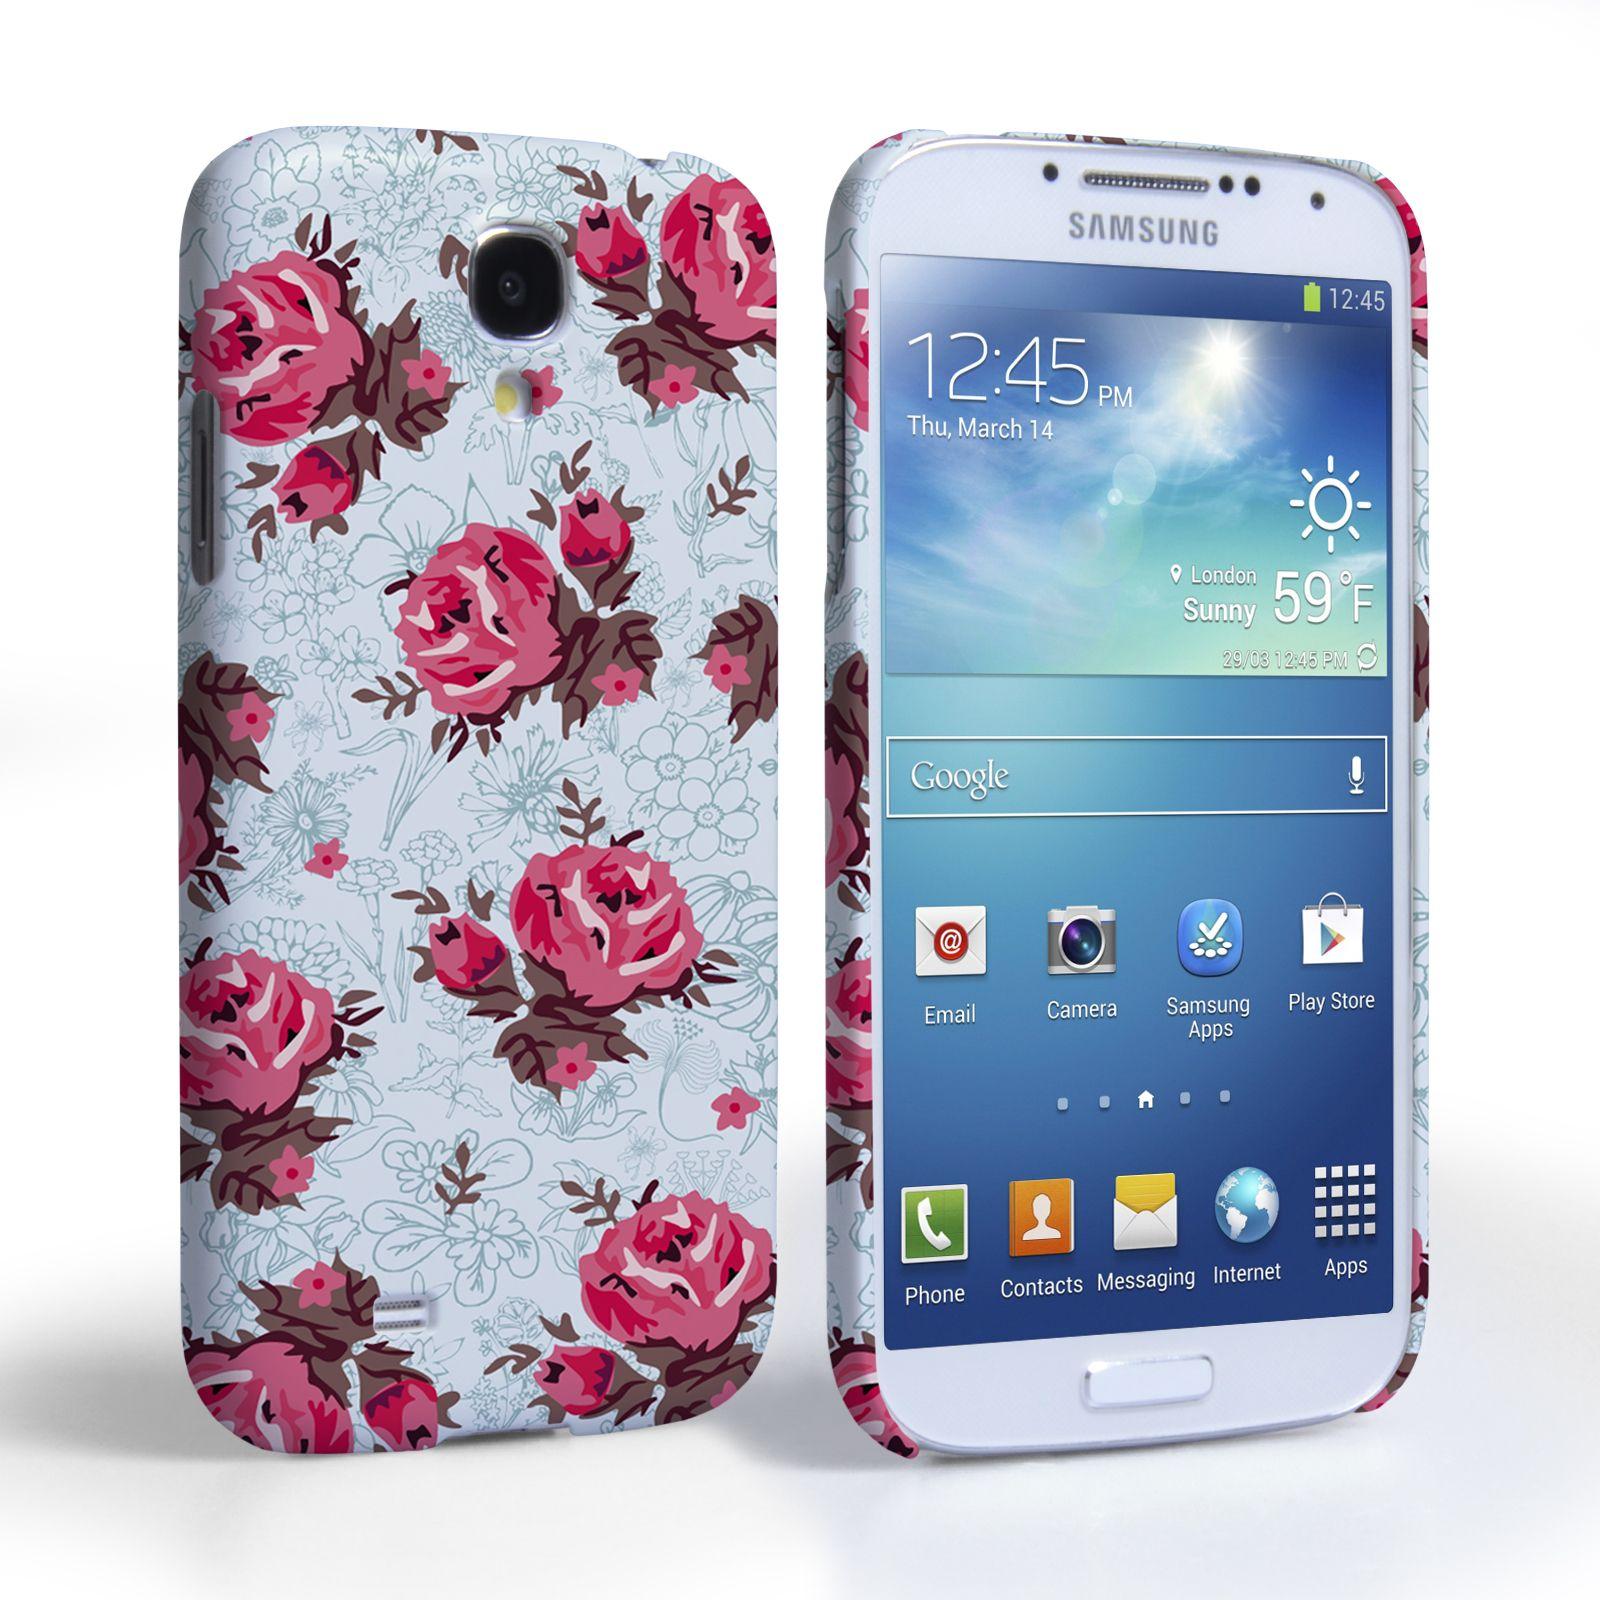 Samsung Galaxy S4 Roses Hard Case Light Blue Samsung Pink Samsung Wallpaper Samsung Galaxy S4